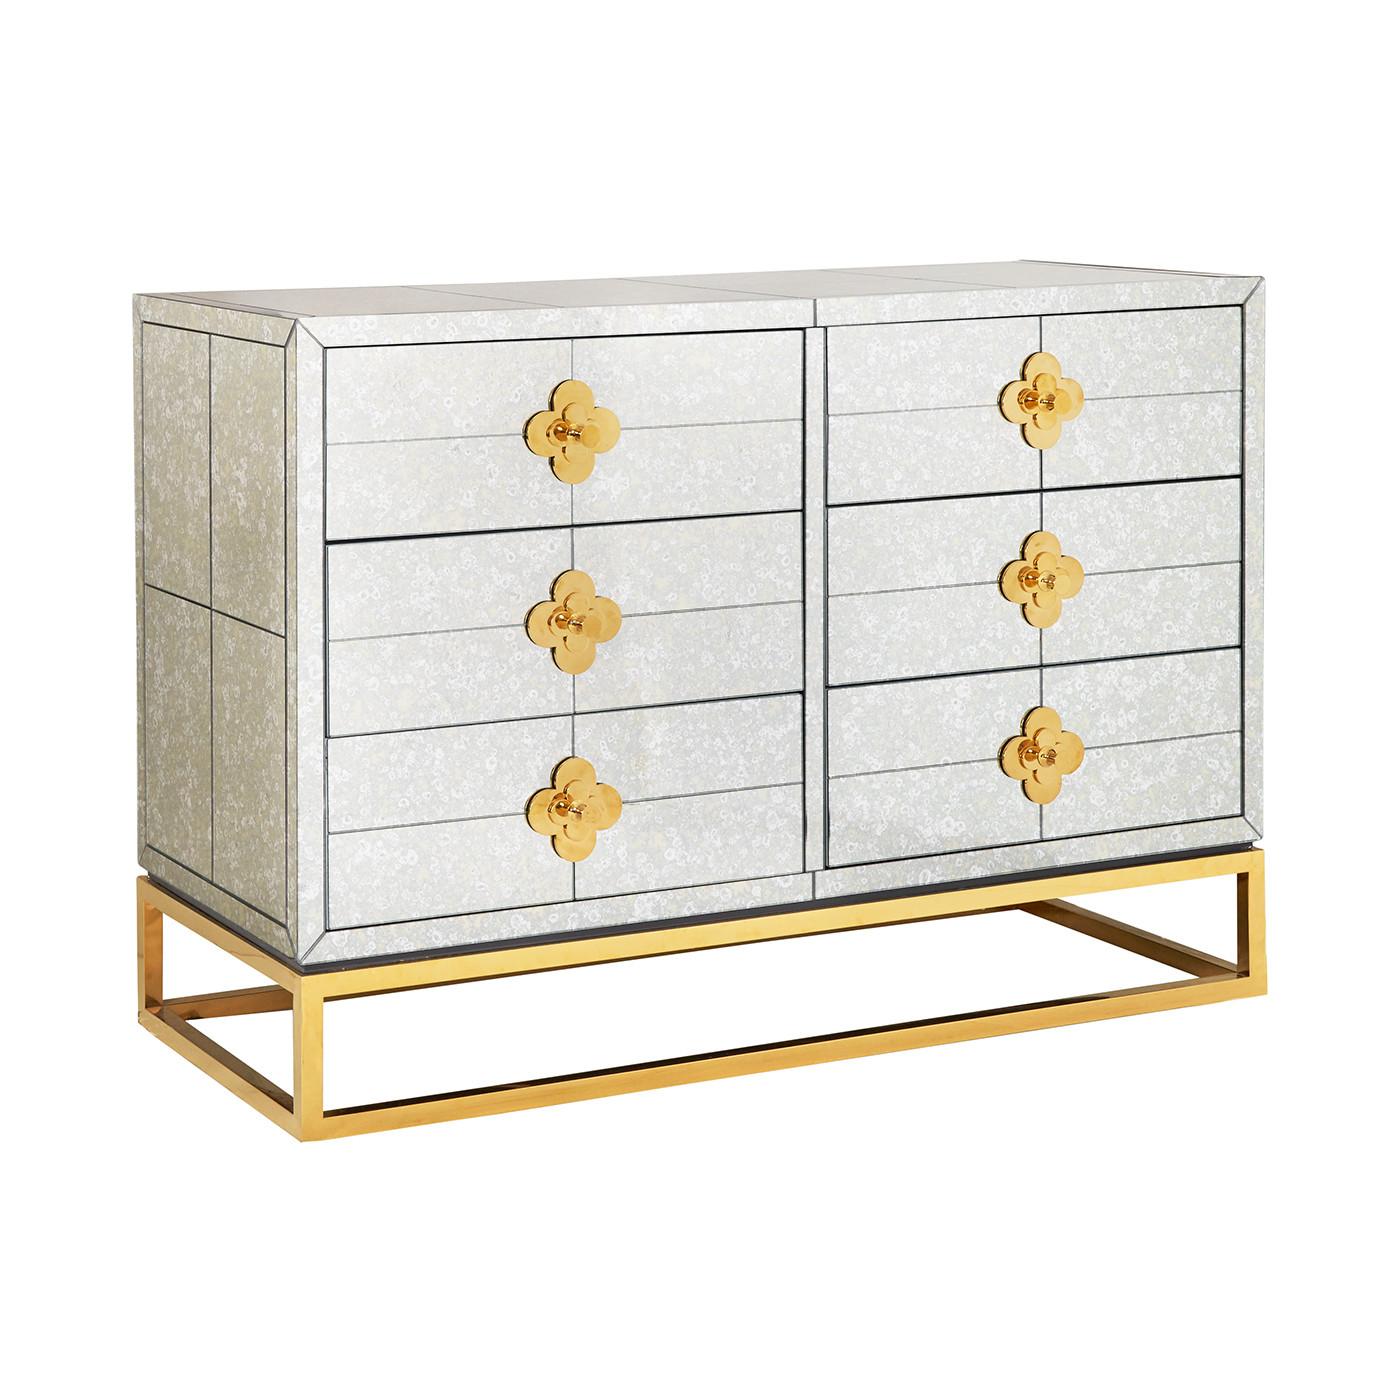 Delphine Six Drawer Dresser